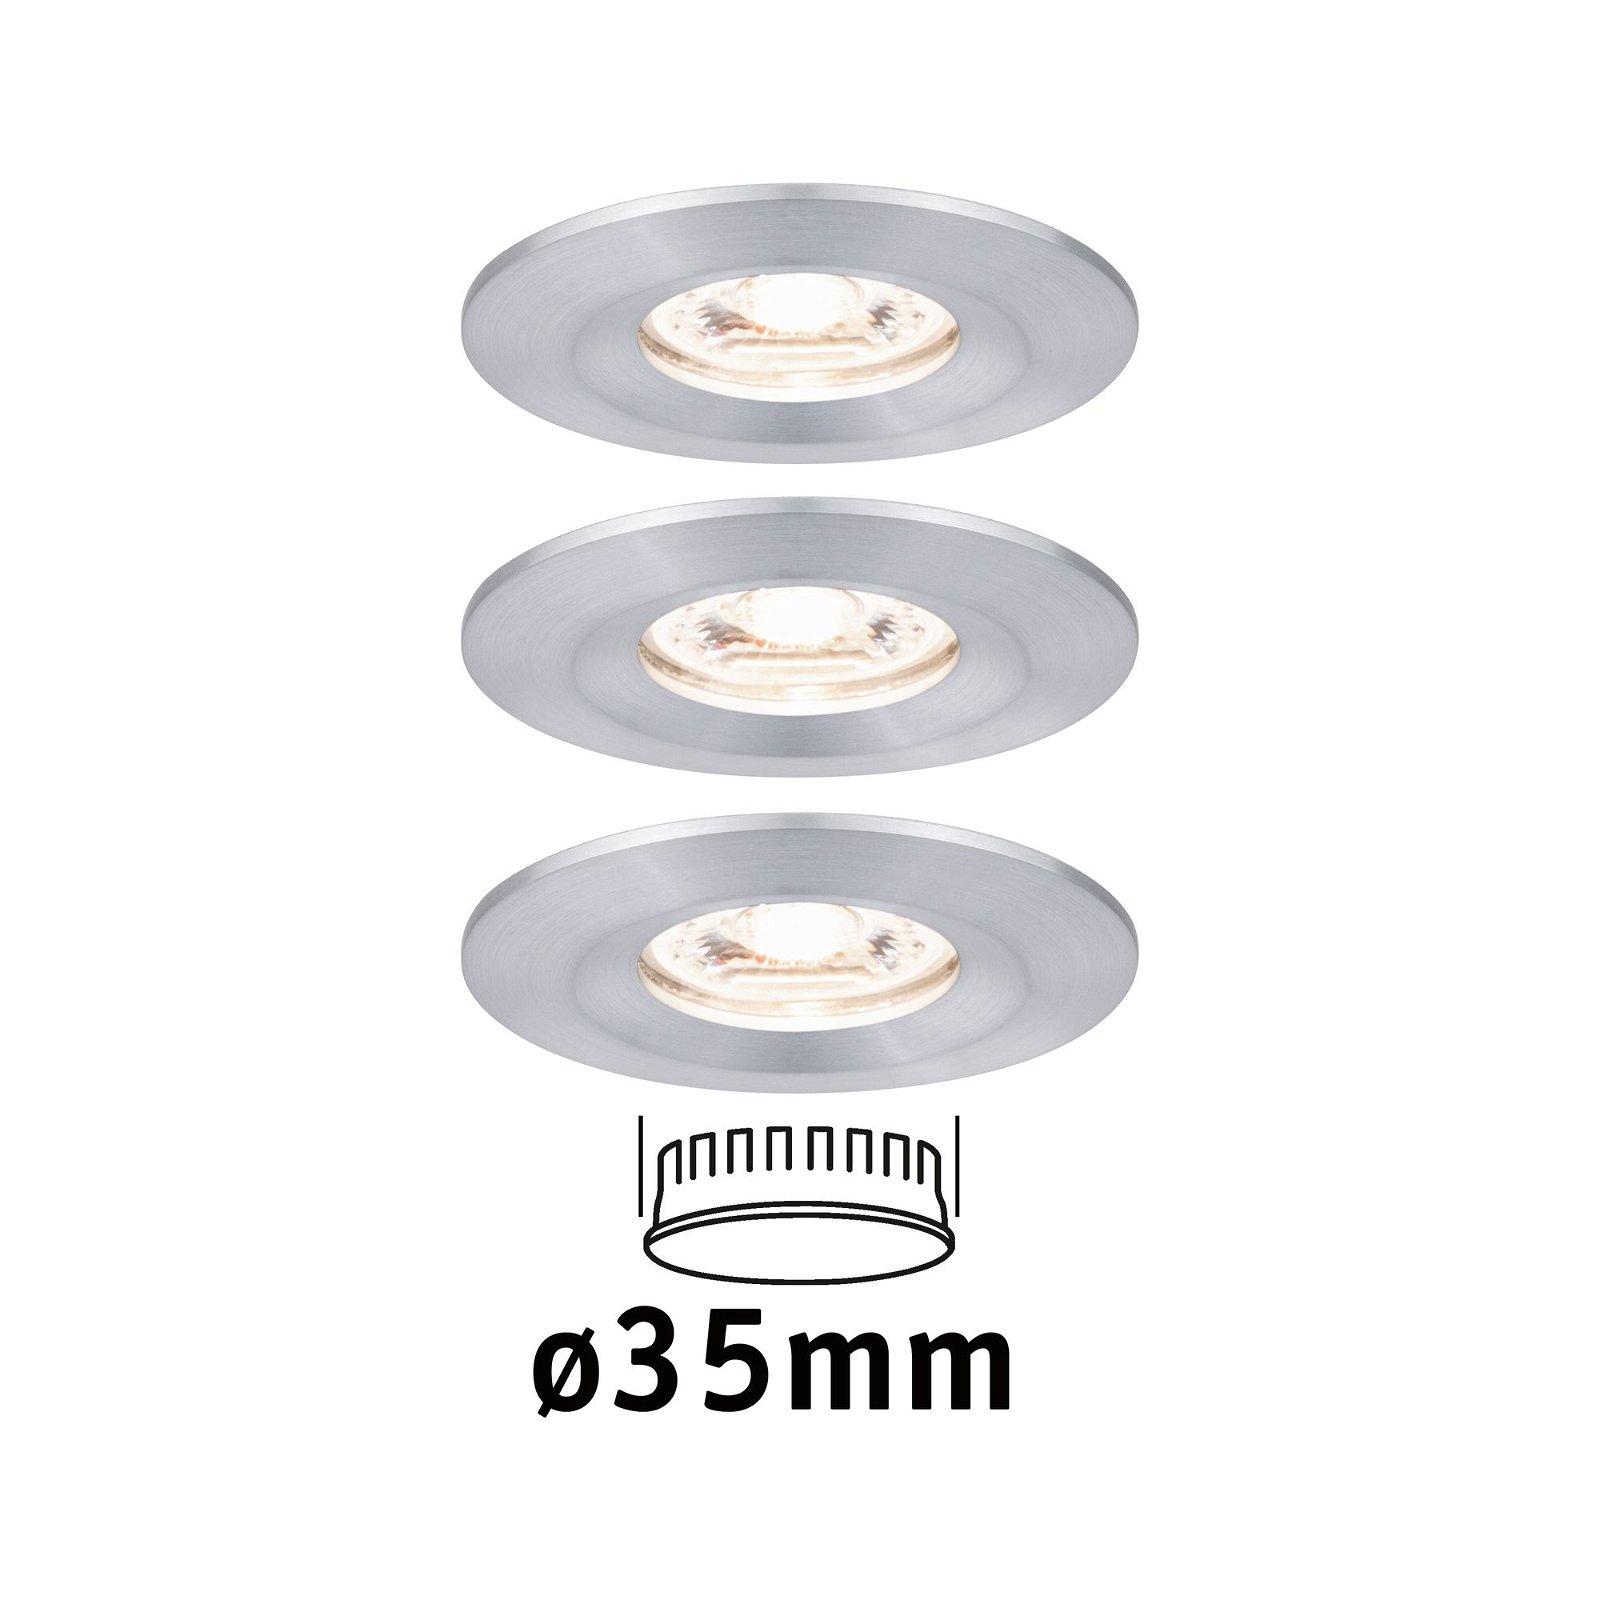 LED Einbauleuchte Nova Mini Coin Basisset starr IP44 rund 65mm Coin 3x4W 3x310lm 230V 2700K Alu gedreht